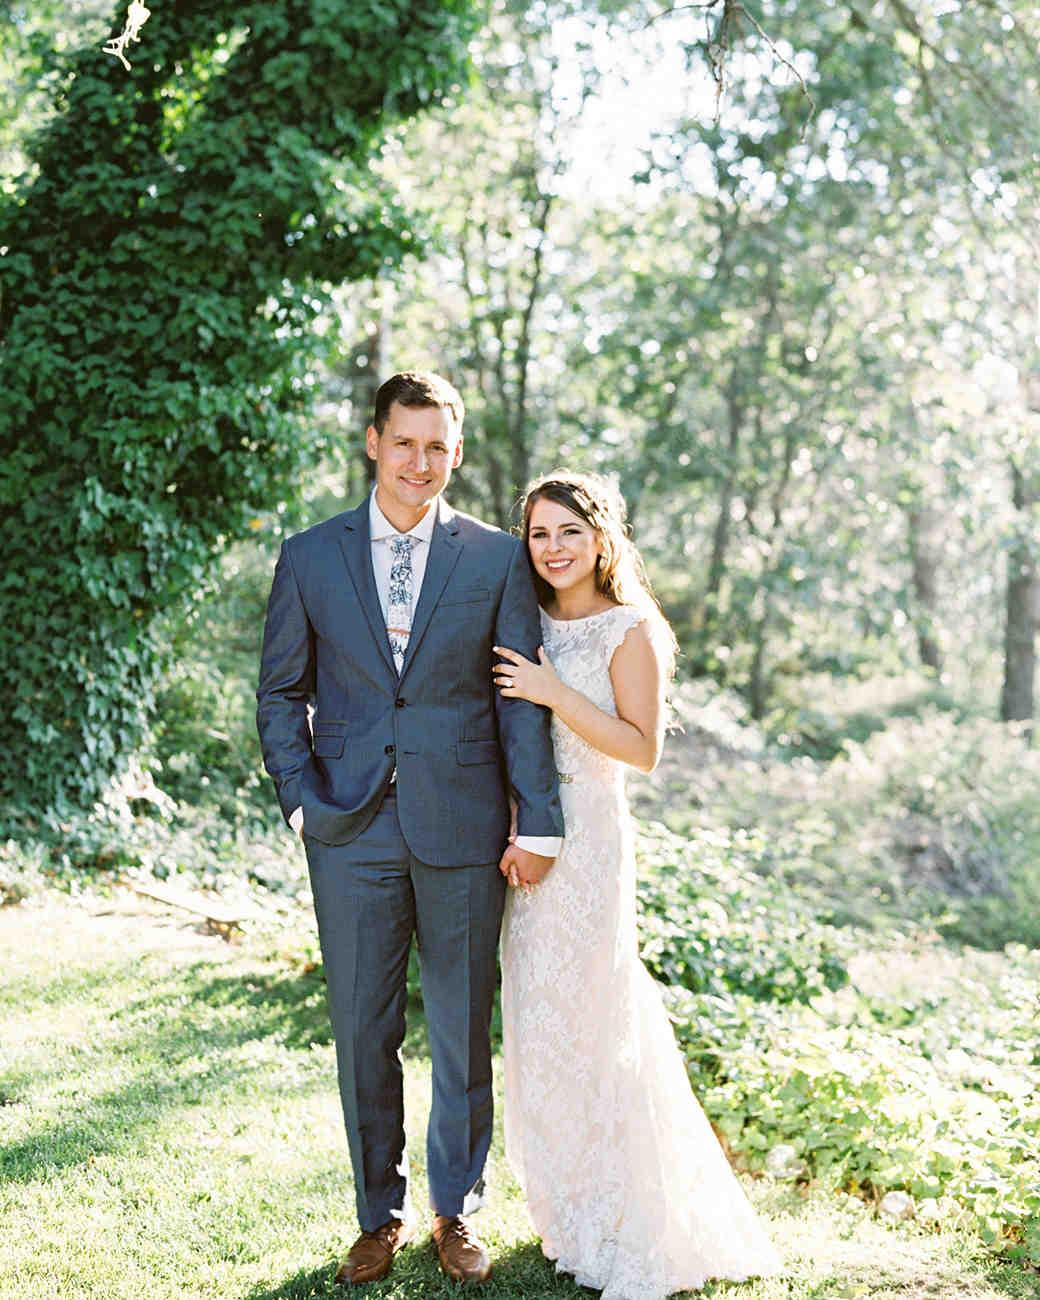 megan scott wedding couple in forest setting